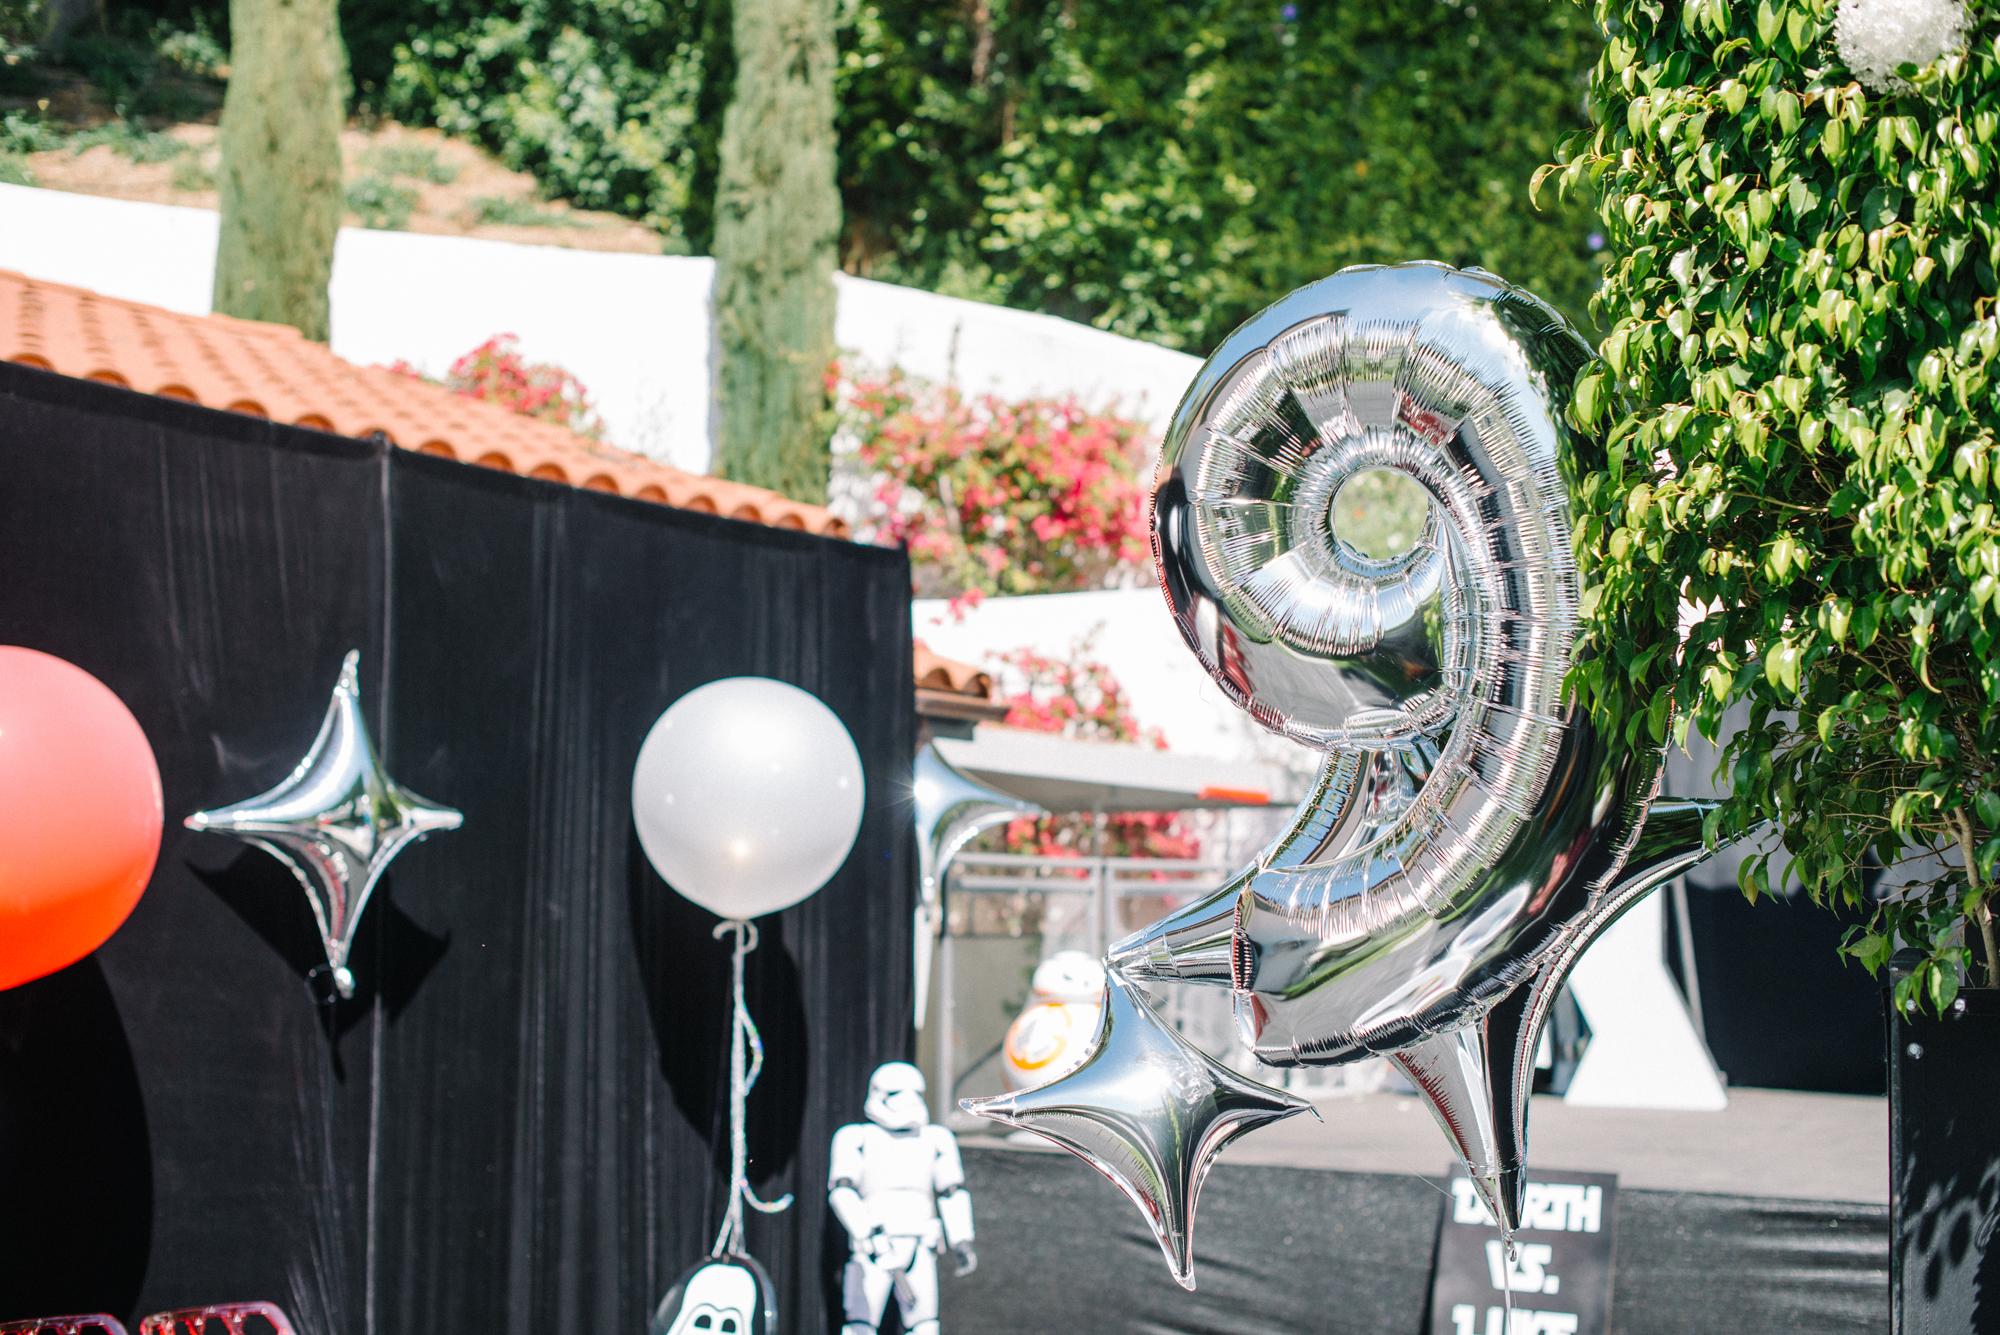 tarynco-events-starwars-themed-kids-birthday-party-balloon-decor.jpg